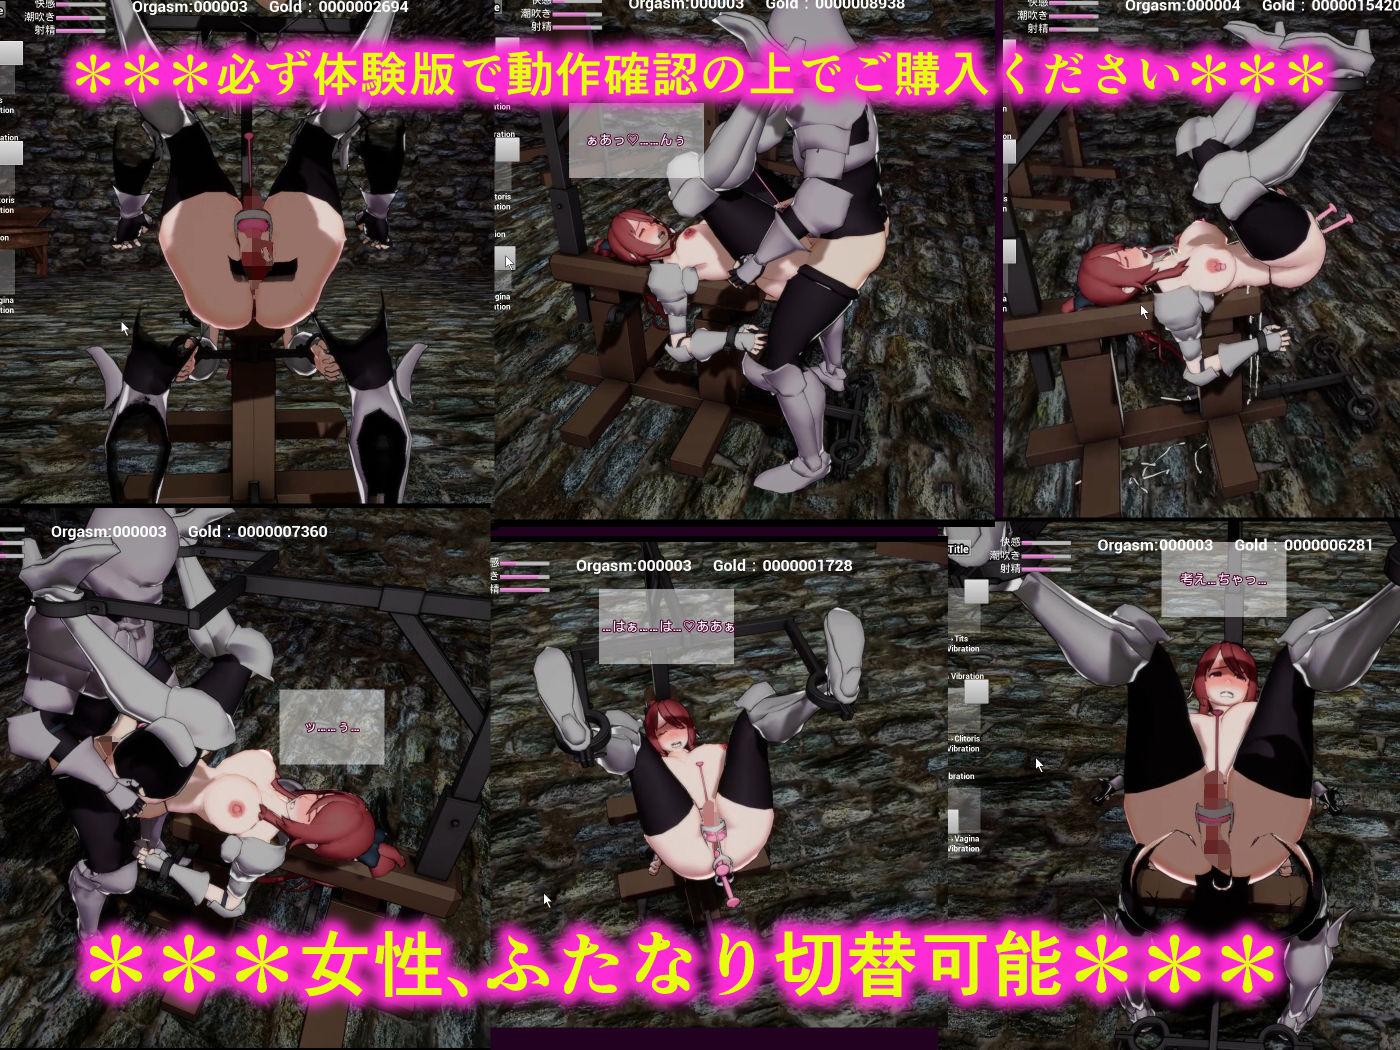 【NEWGAME! 同人】女騎士アメリアと闇の組織~リアルタイム3D拘束シミュ~